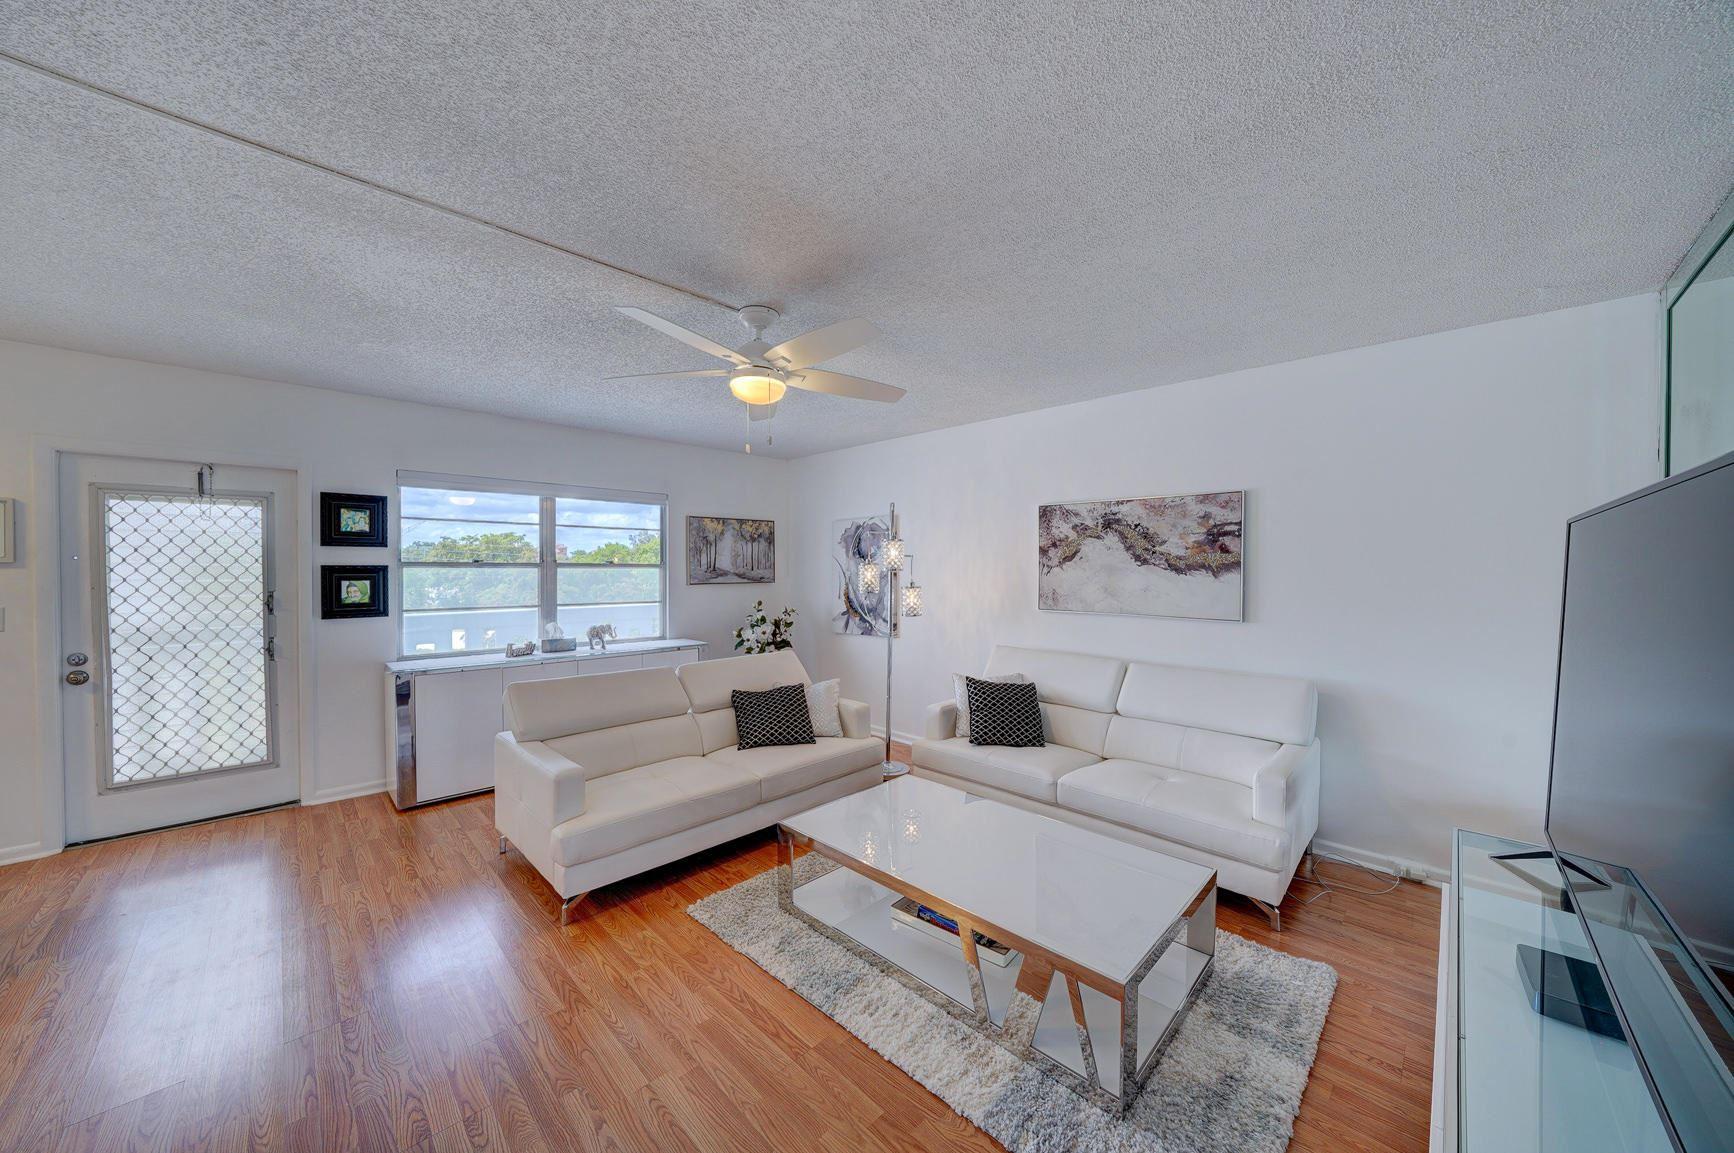 4029 Ventnor H, Deerfield Beach, FL 33442 - MLS#: RX-10717178